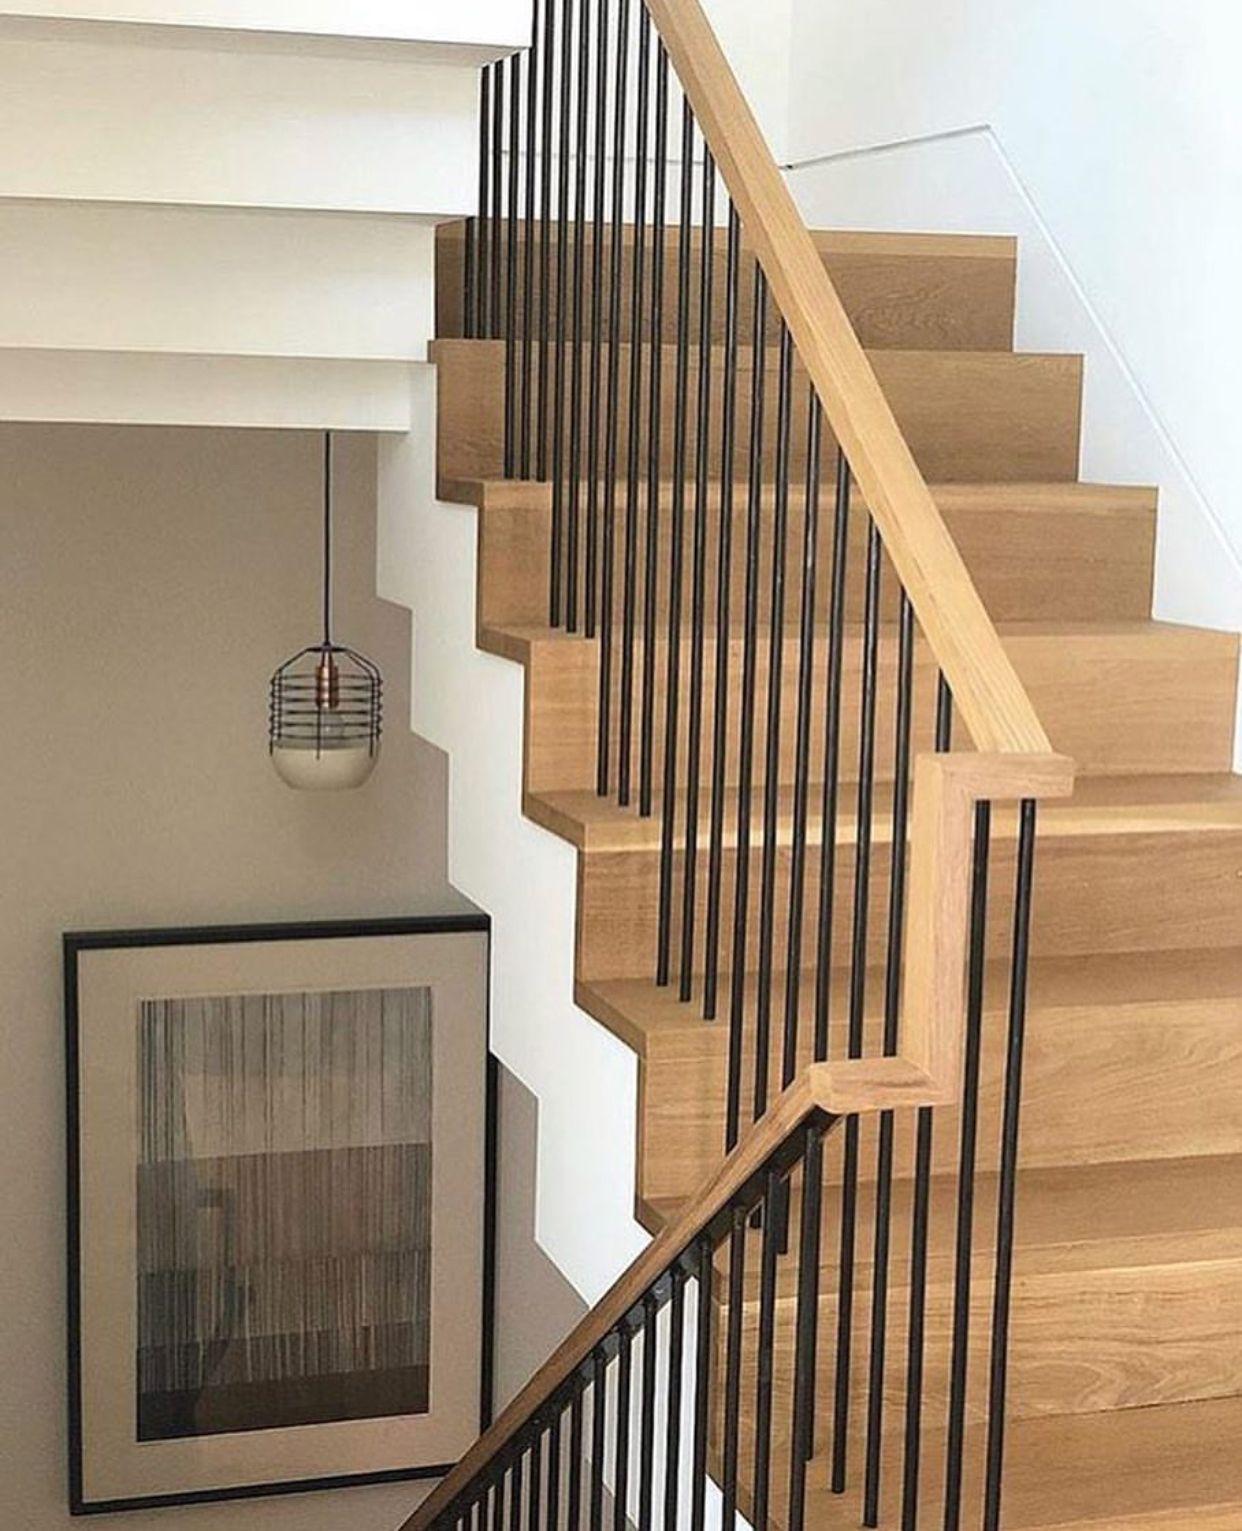 stairs stairs ekkor 2019 staircase handrail interior stairs s rh pinterest com